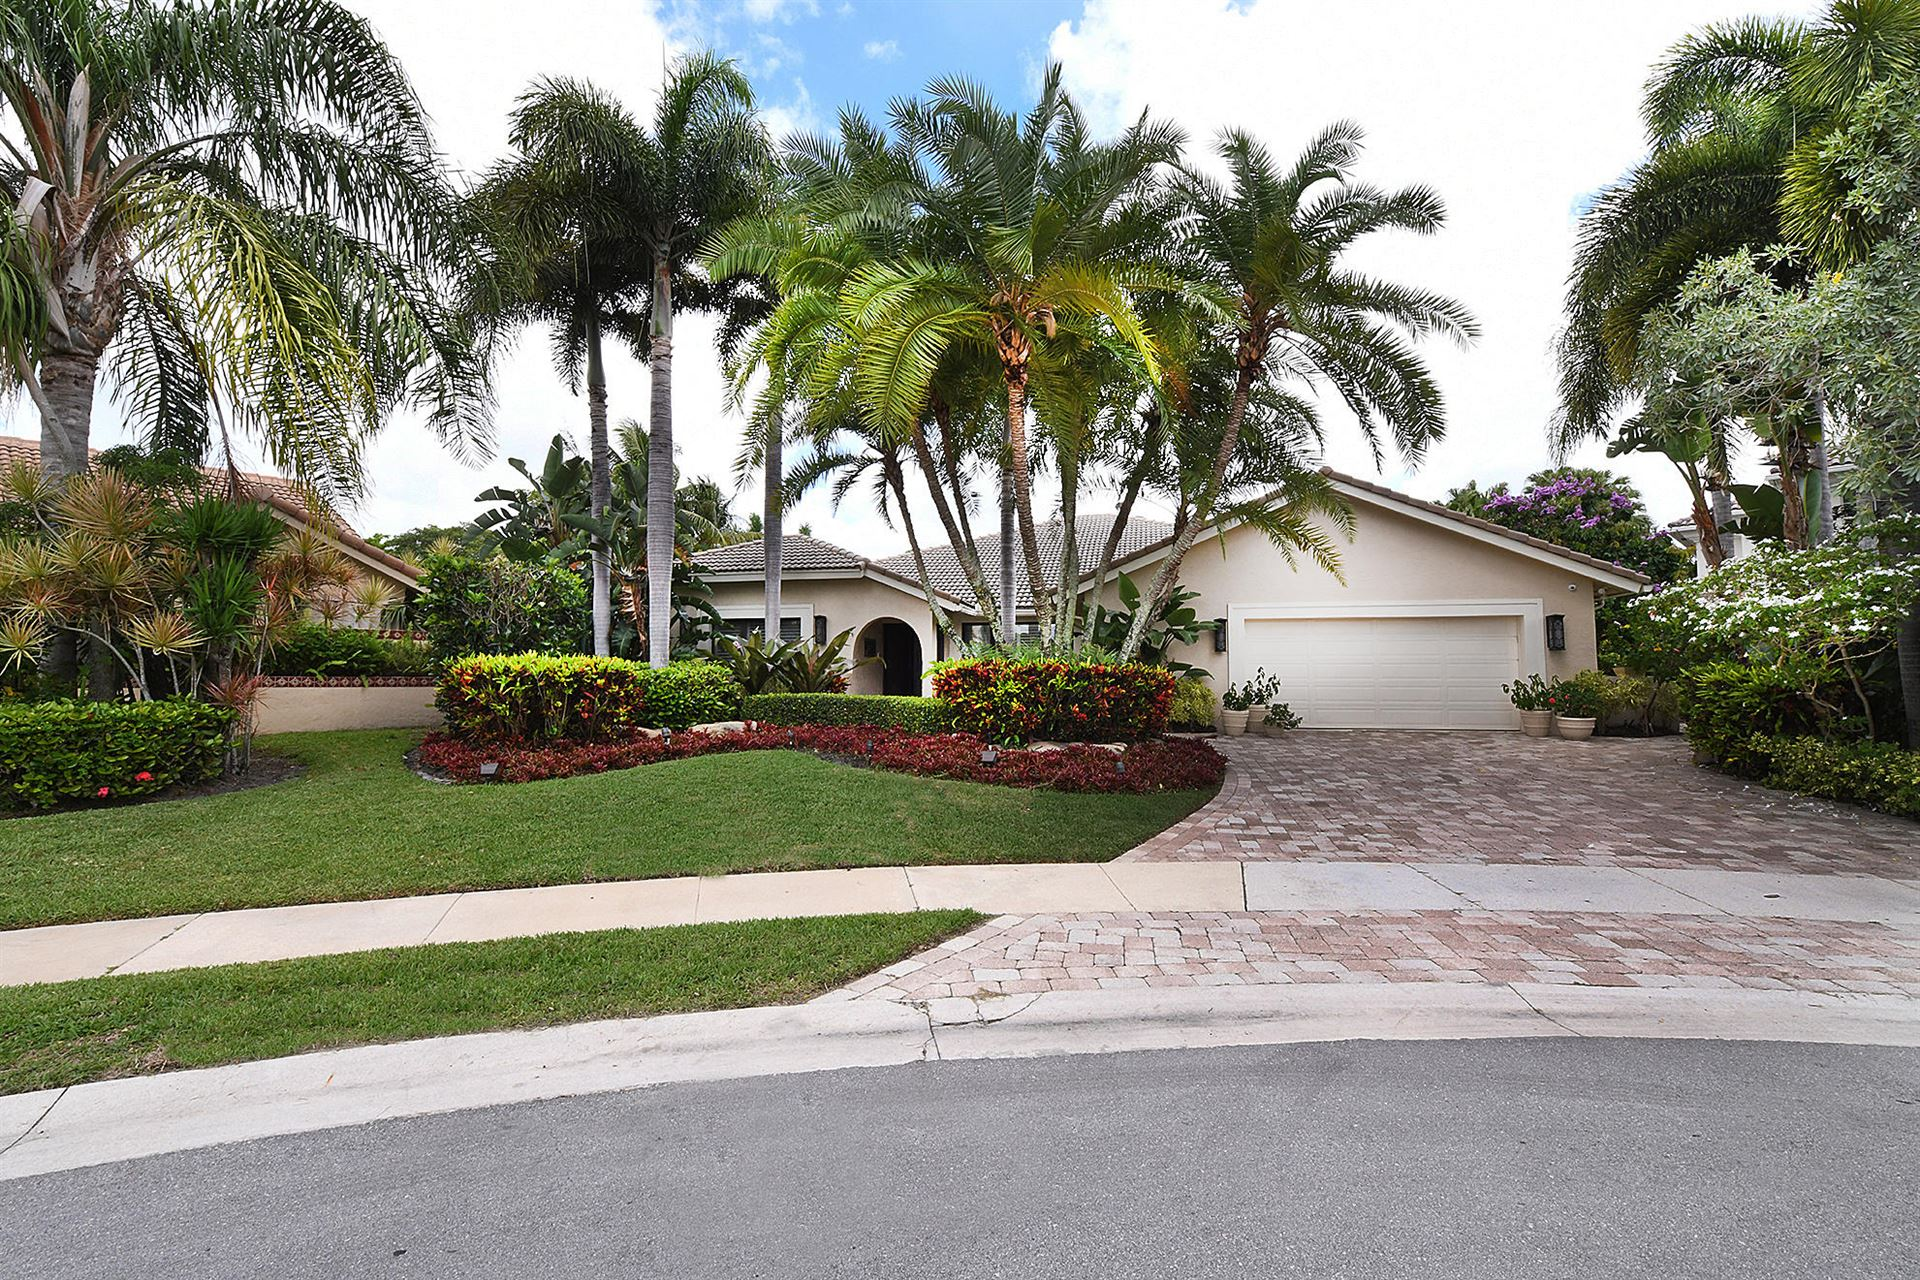 7750 Tennyson Court, Boca Raton, FL 33433 - #: RX-10722347